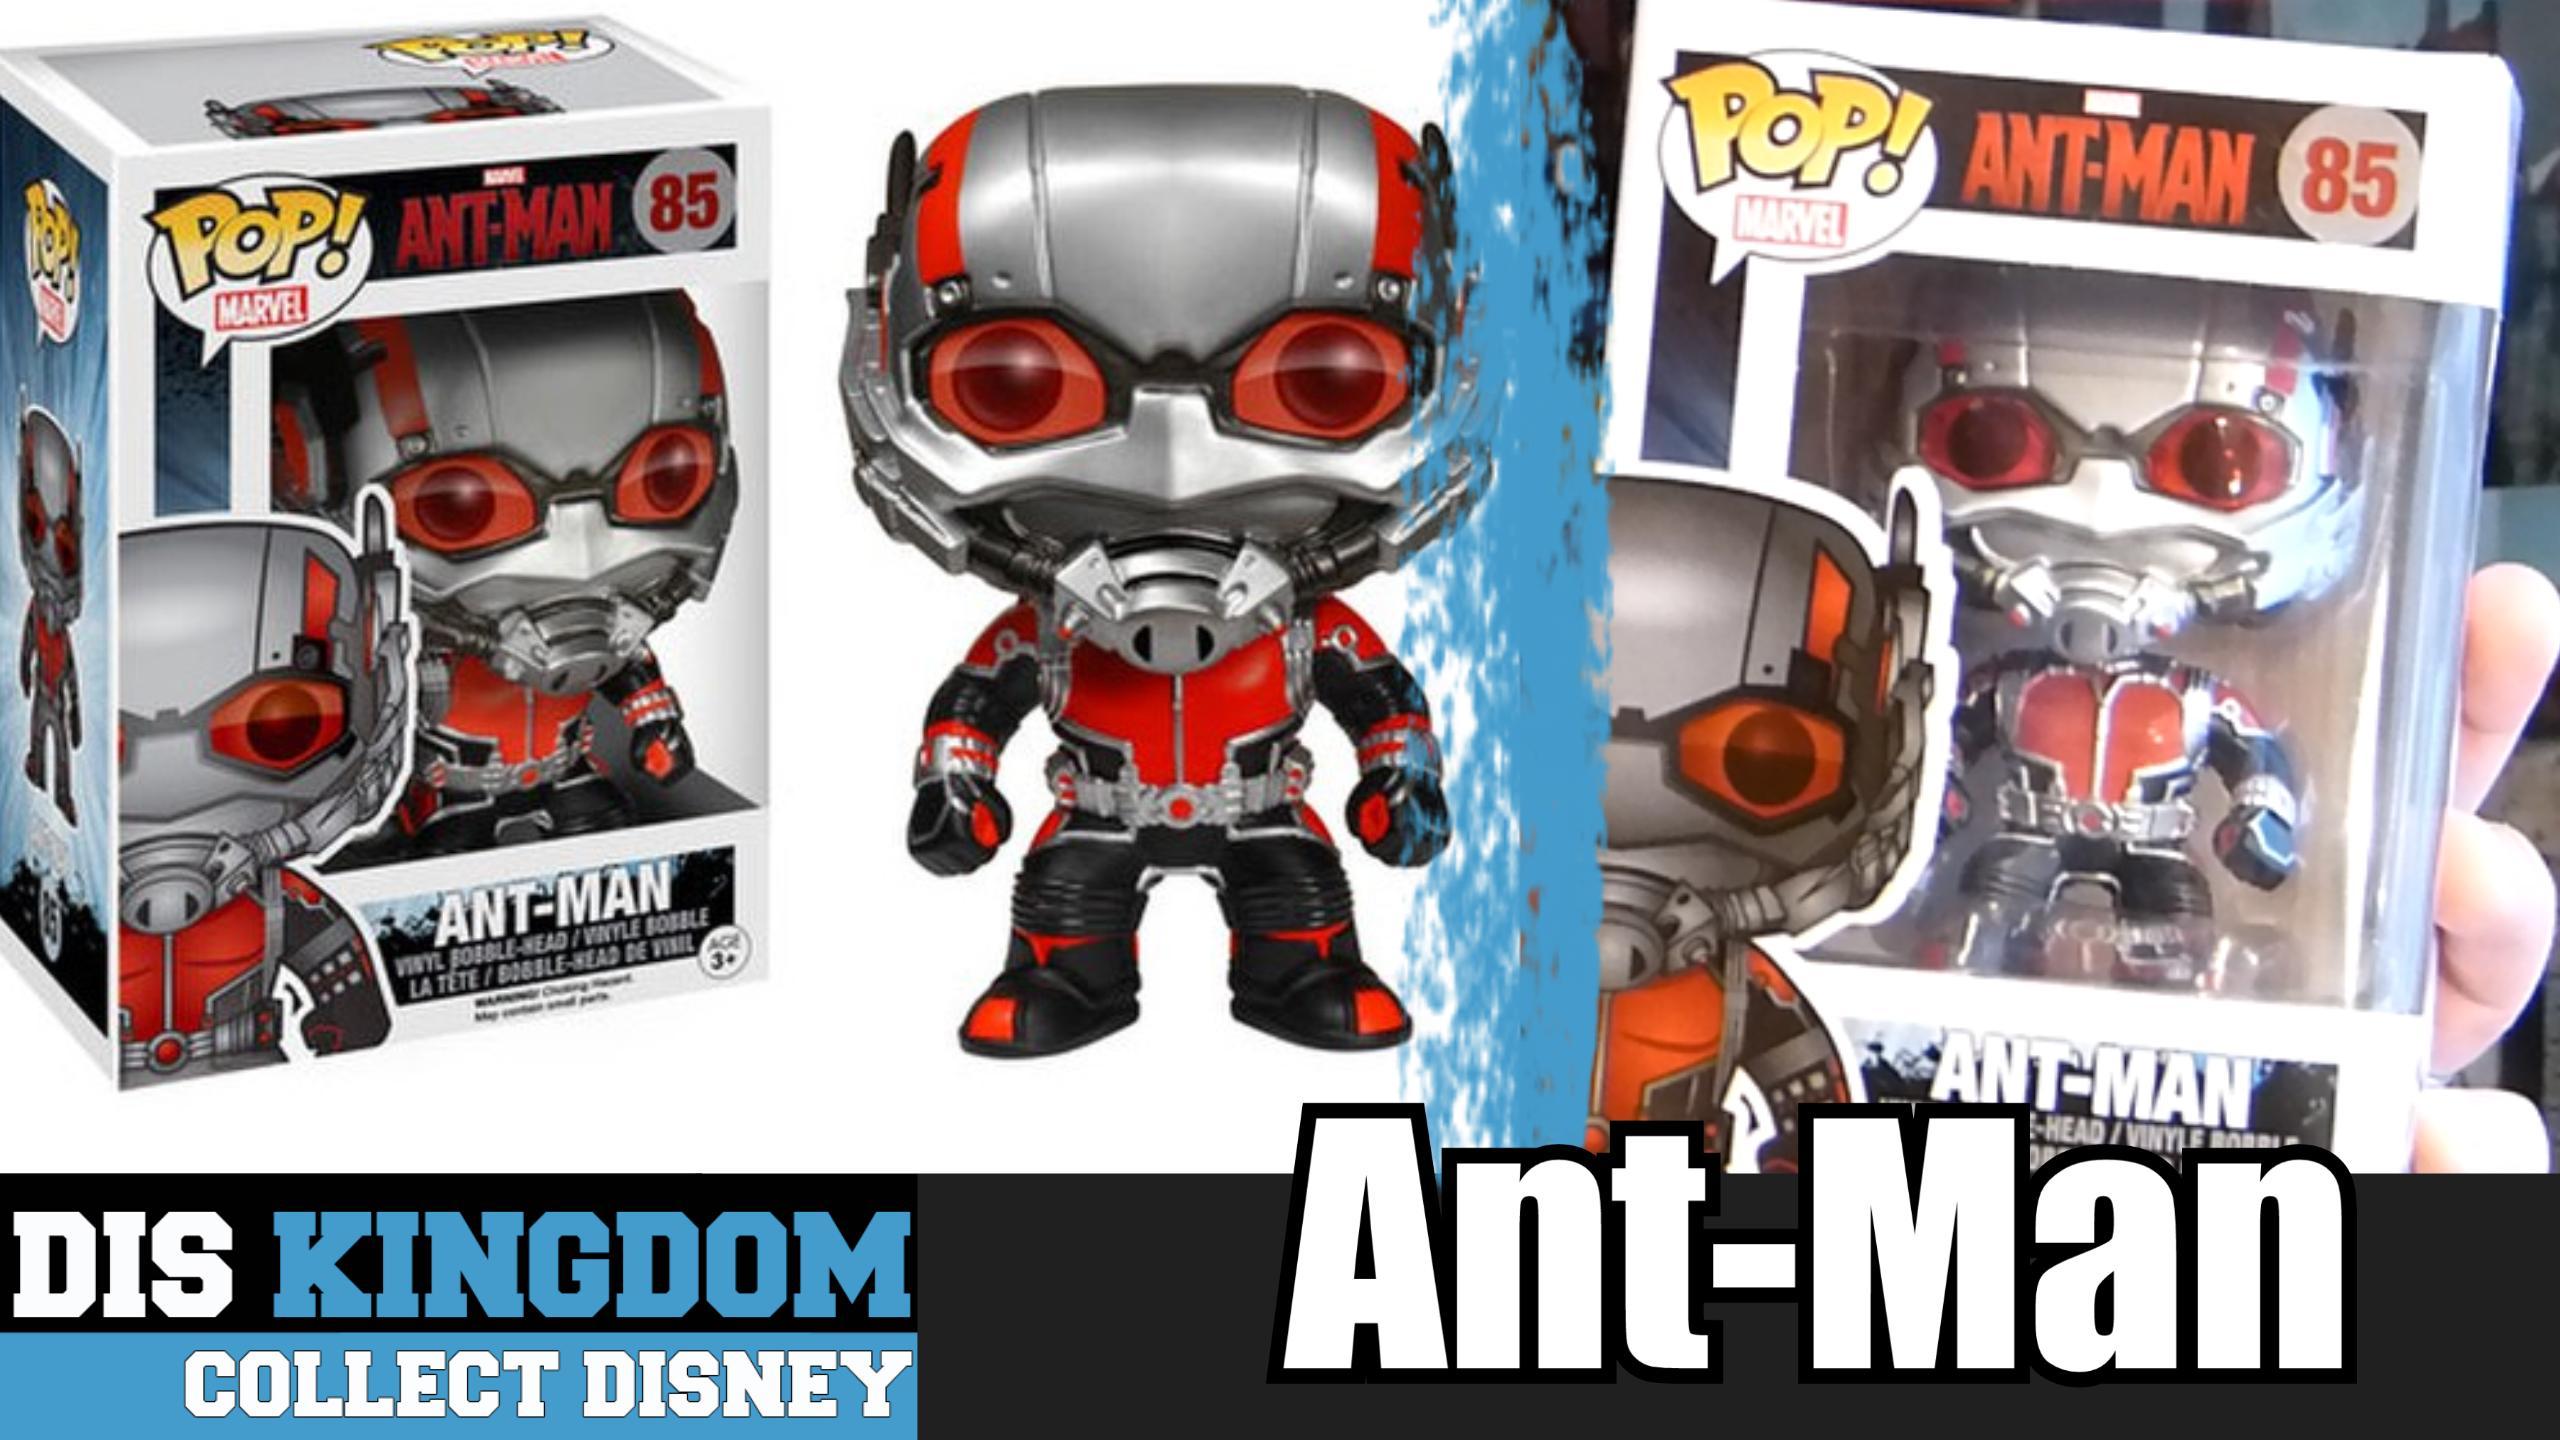 Ant-Man Pop Vinyl Unboxing